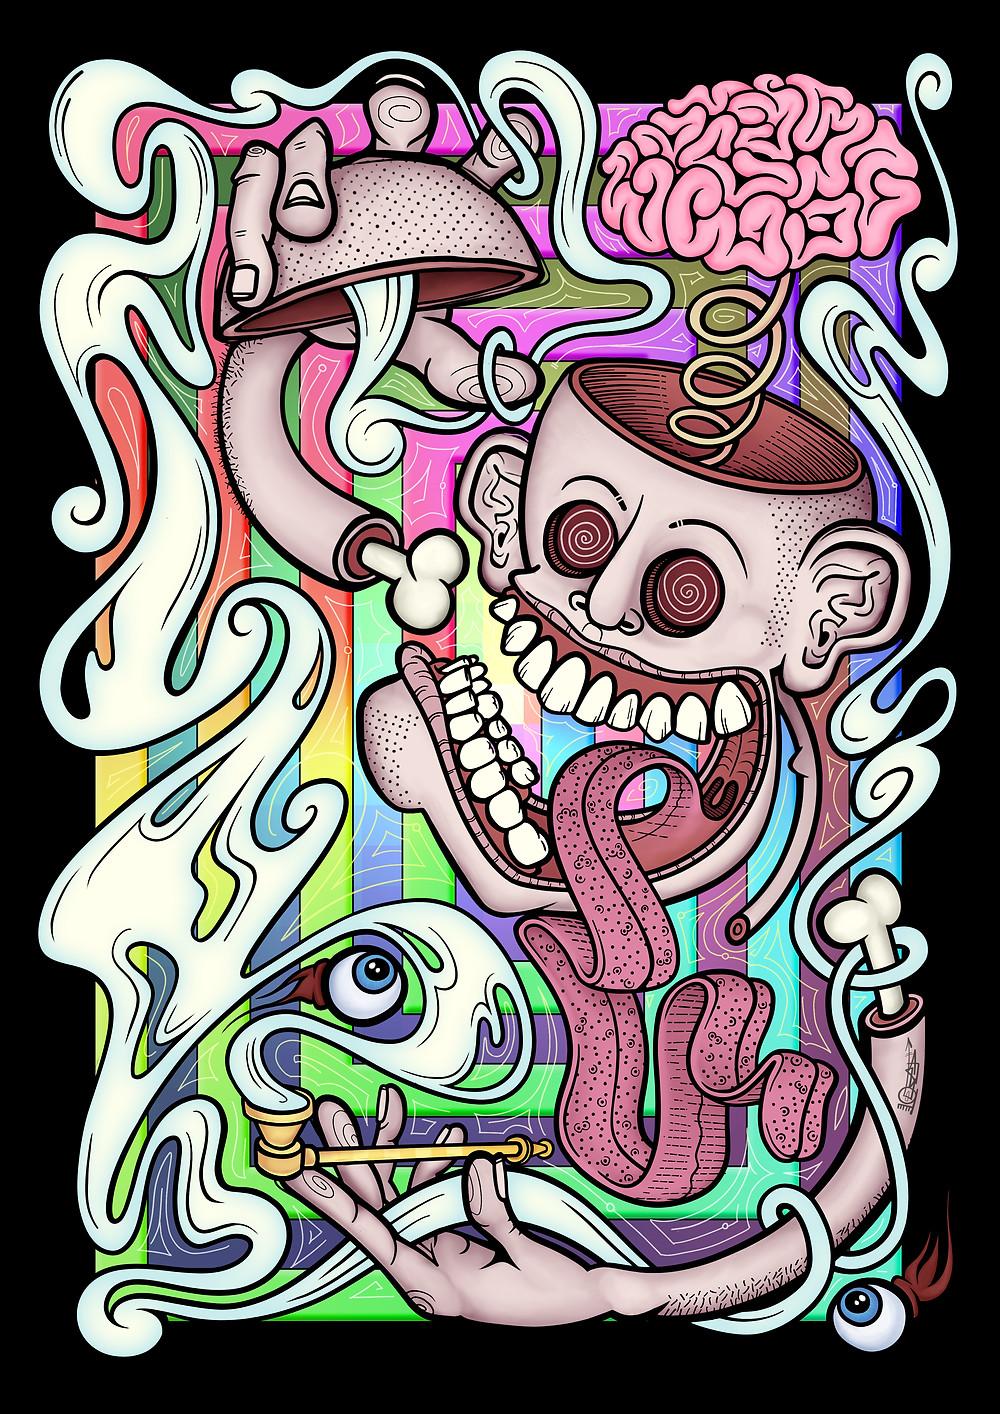 Pipedream Psych artwork by Alga